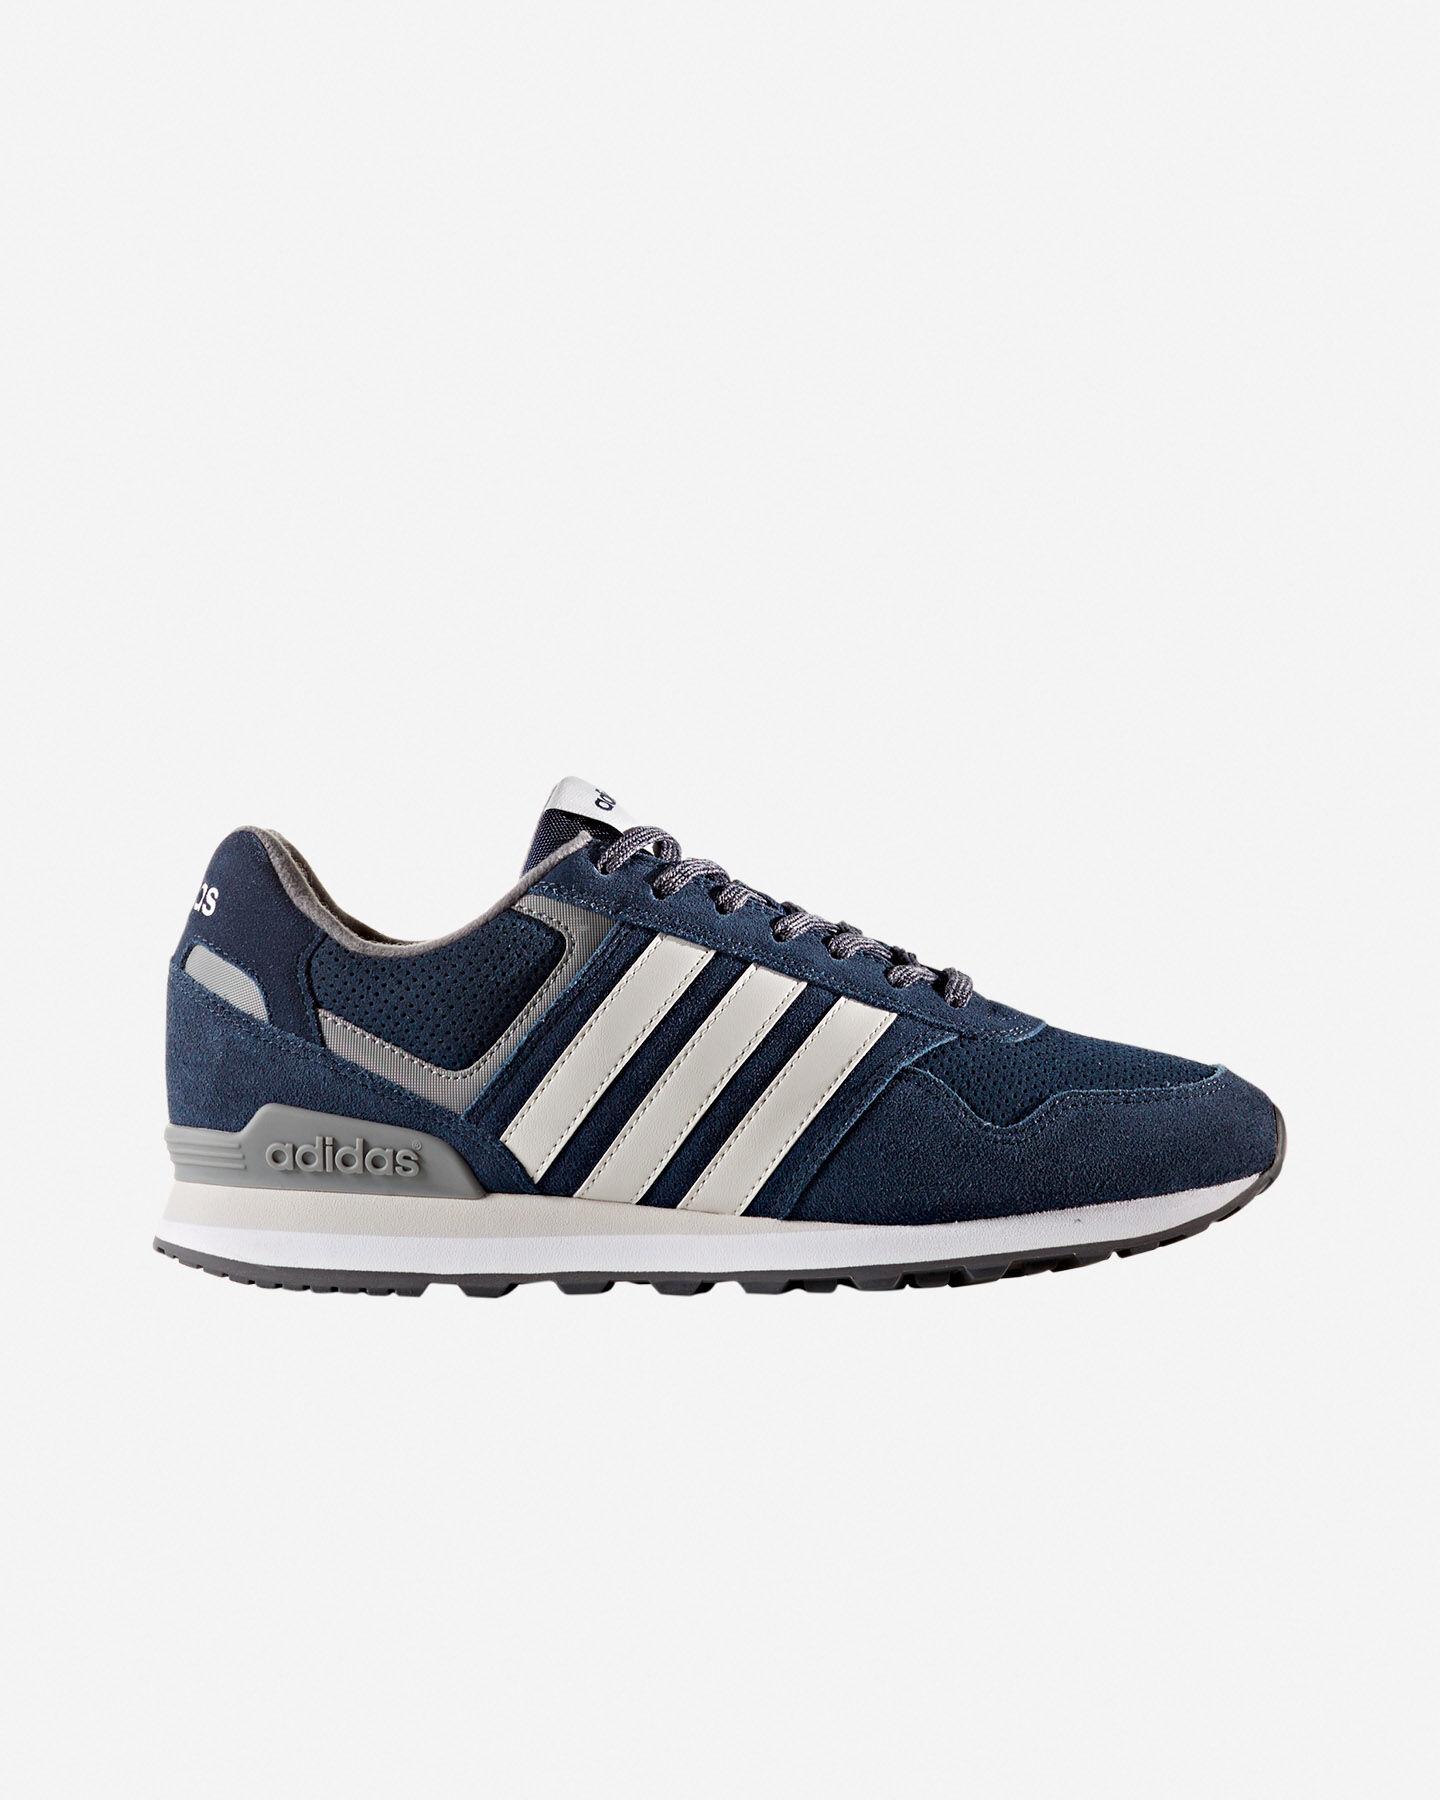 scarpe ginnastica uomo adidas 10 k